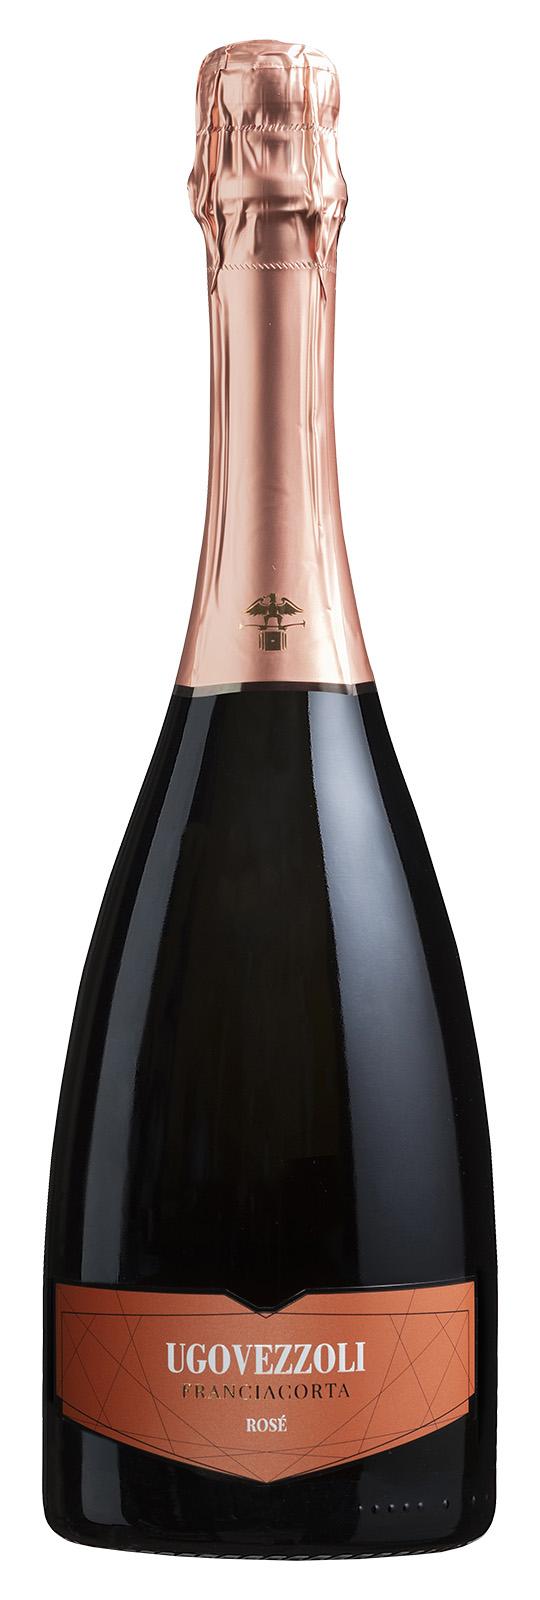 prodotti Ugo Vezzoli - Vini in Franciacorta